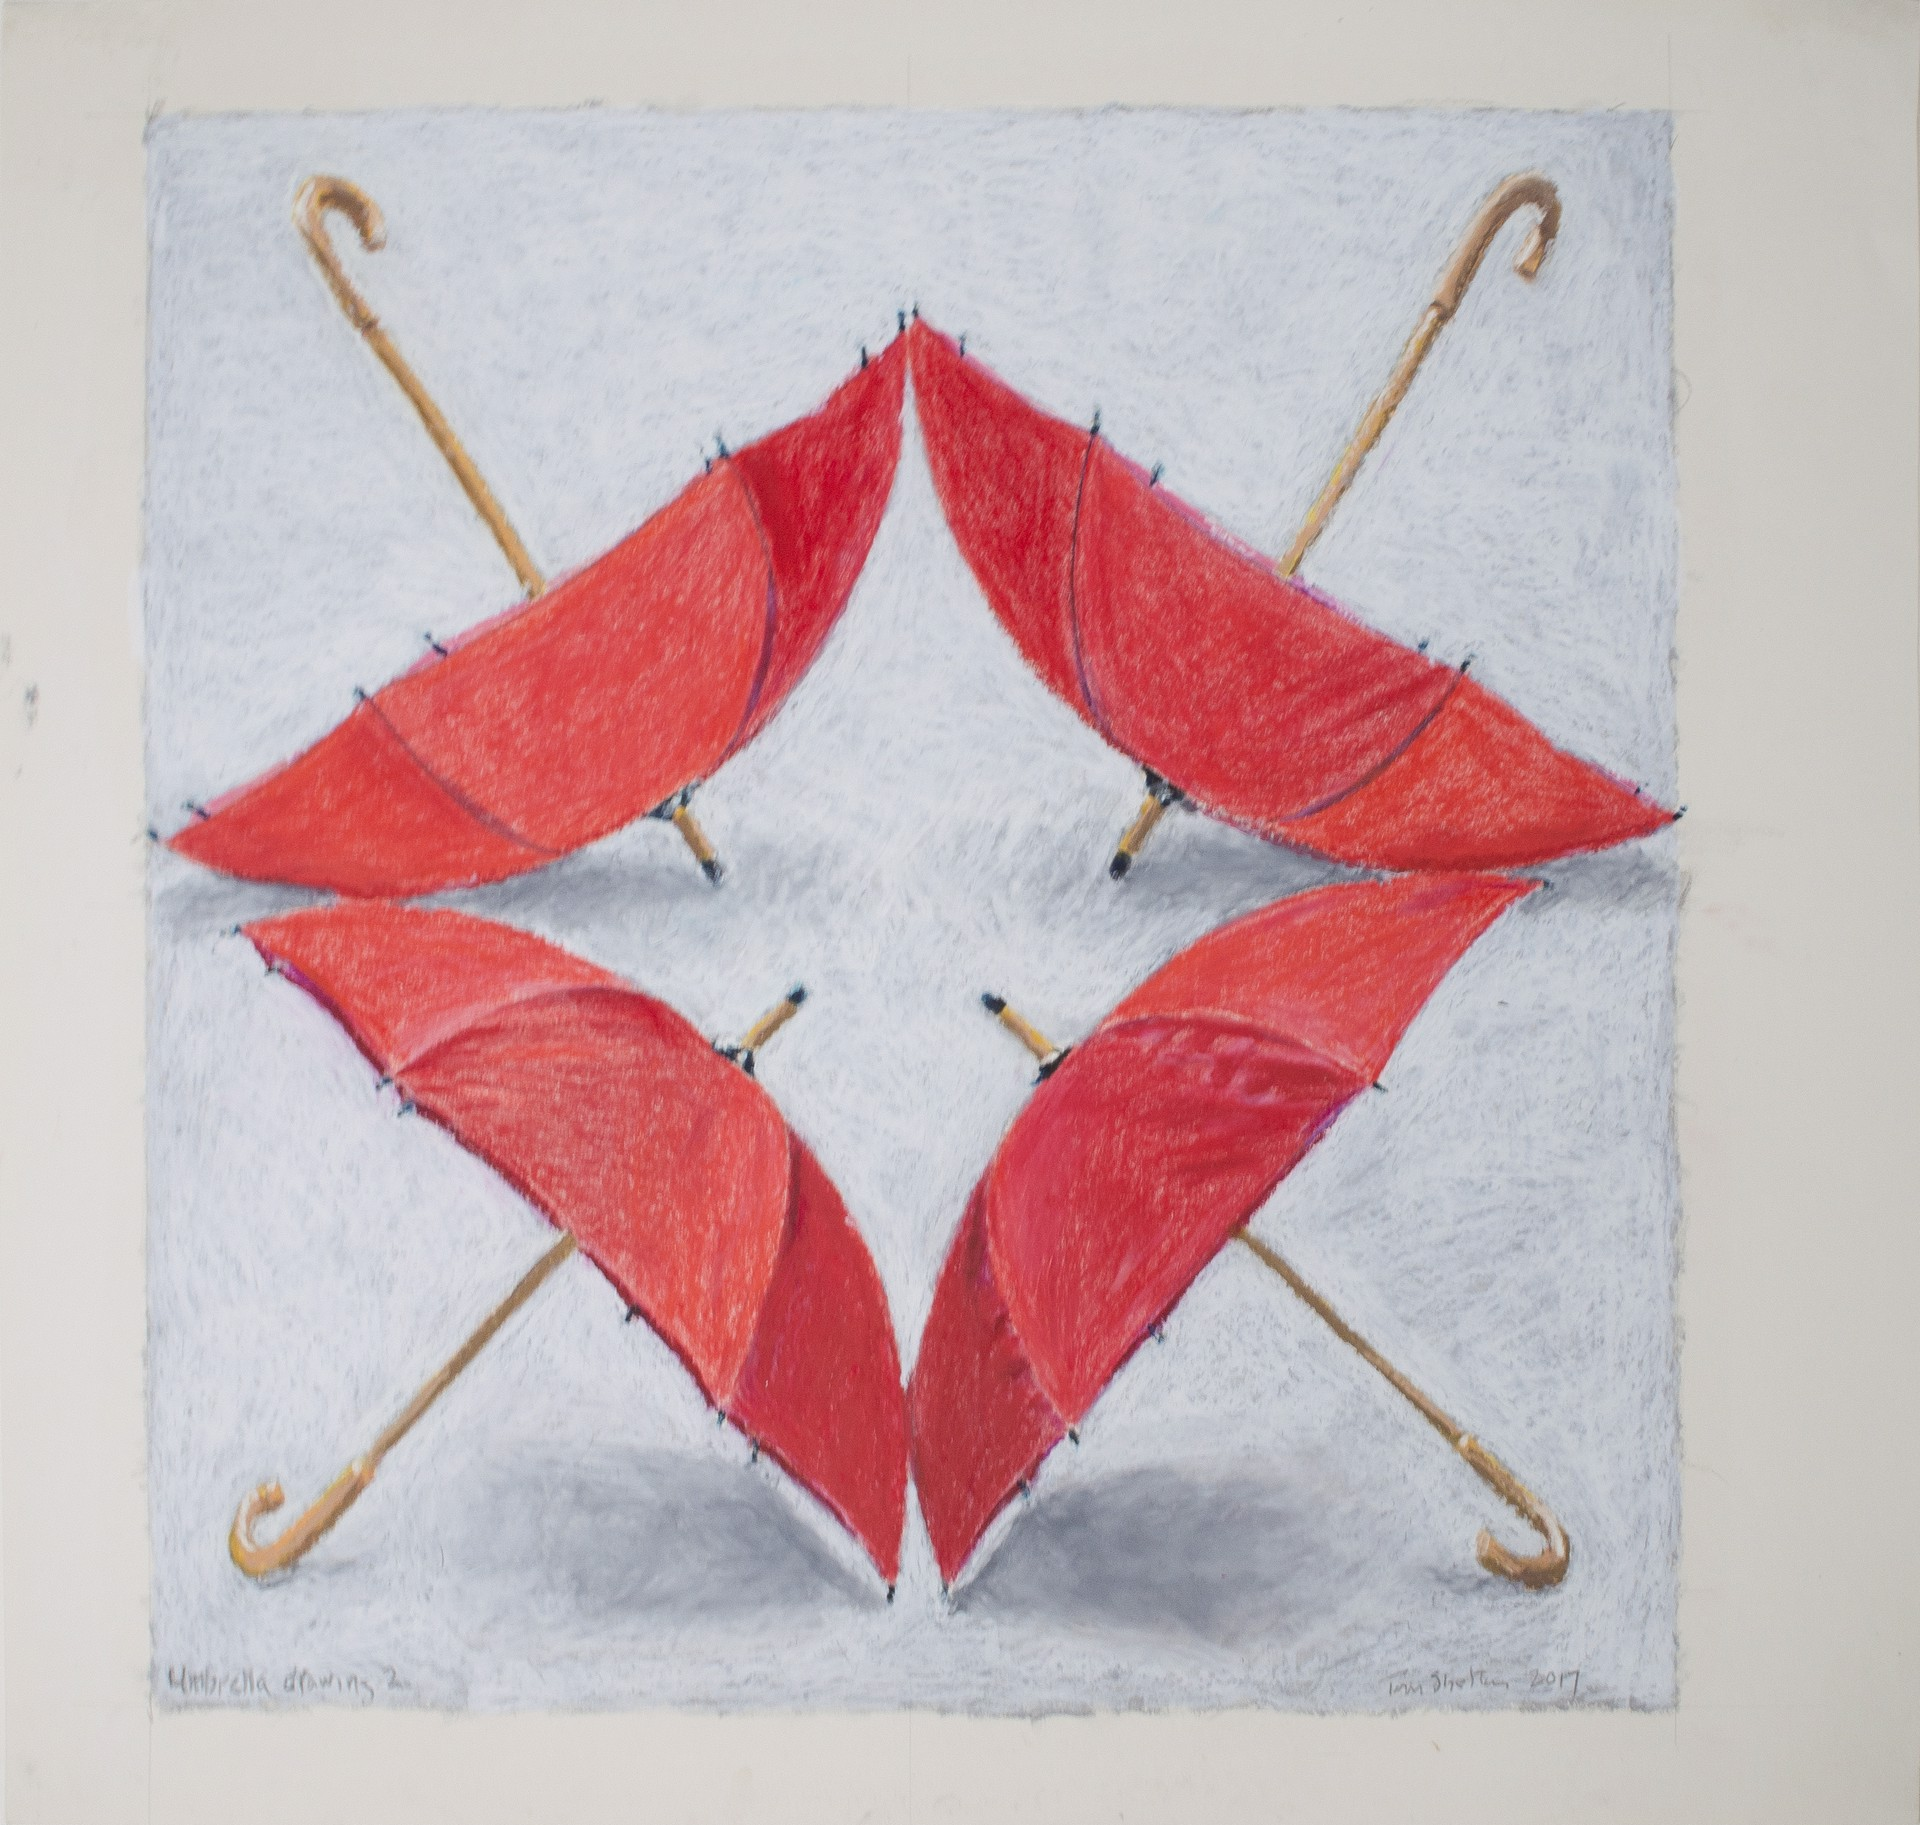 Umbrella Drawing II by Tom Shelton